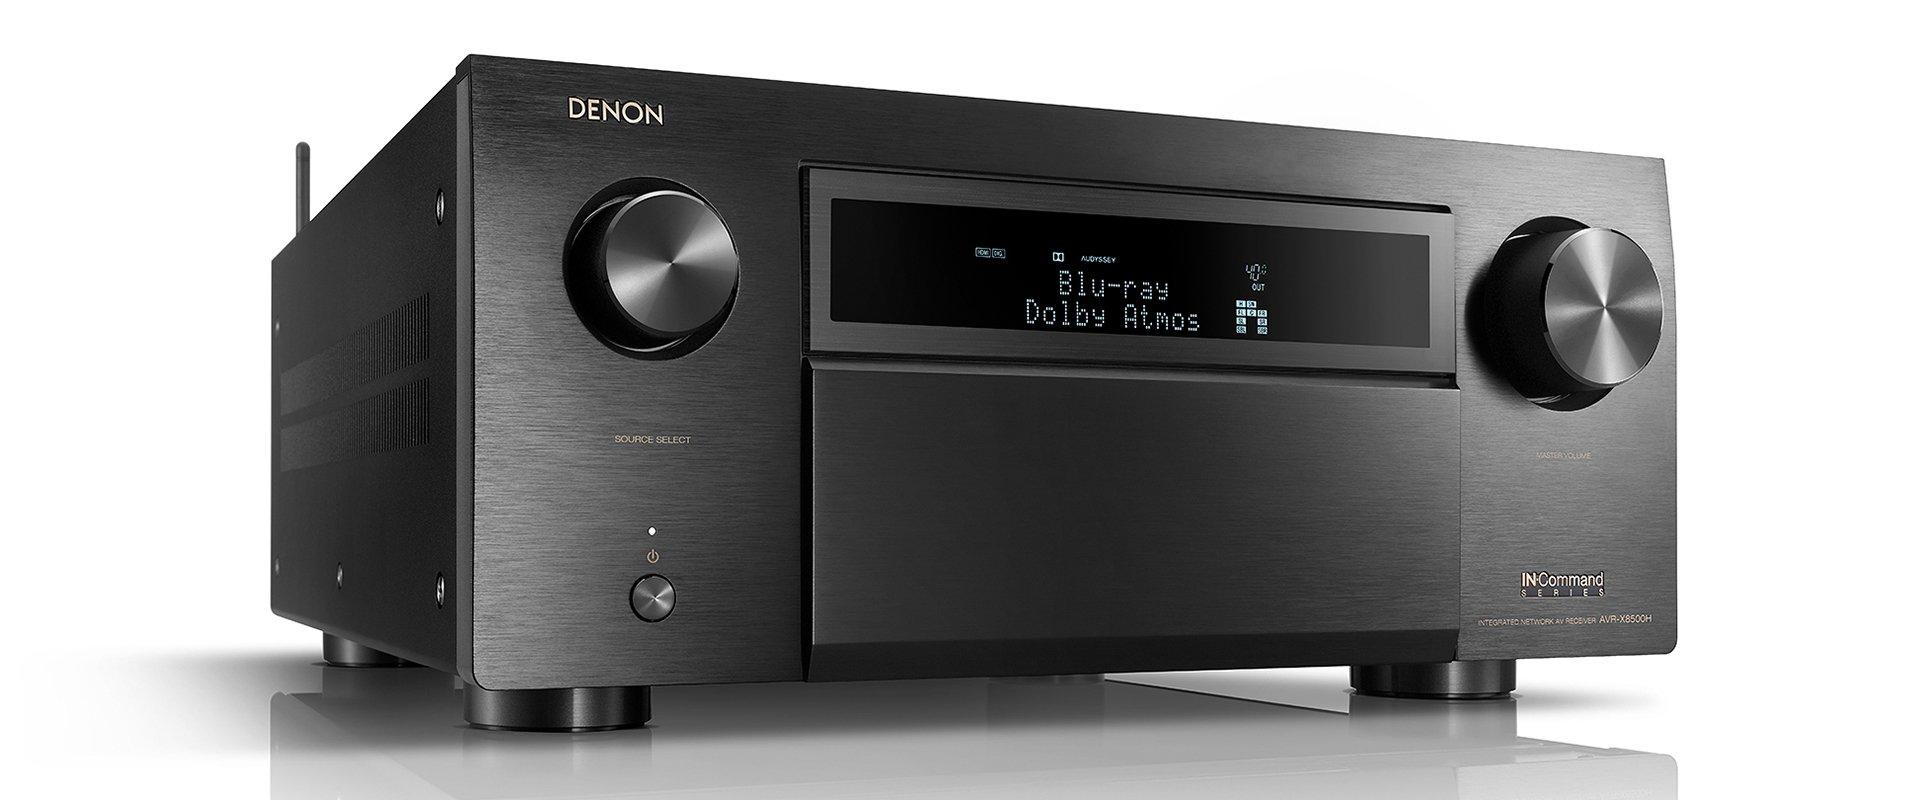 Denon AVR-X8500H Receiver